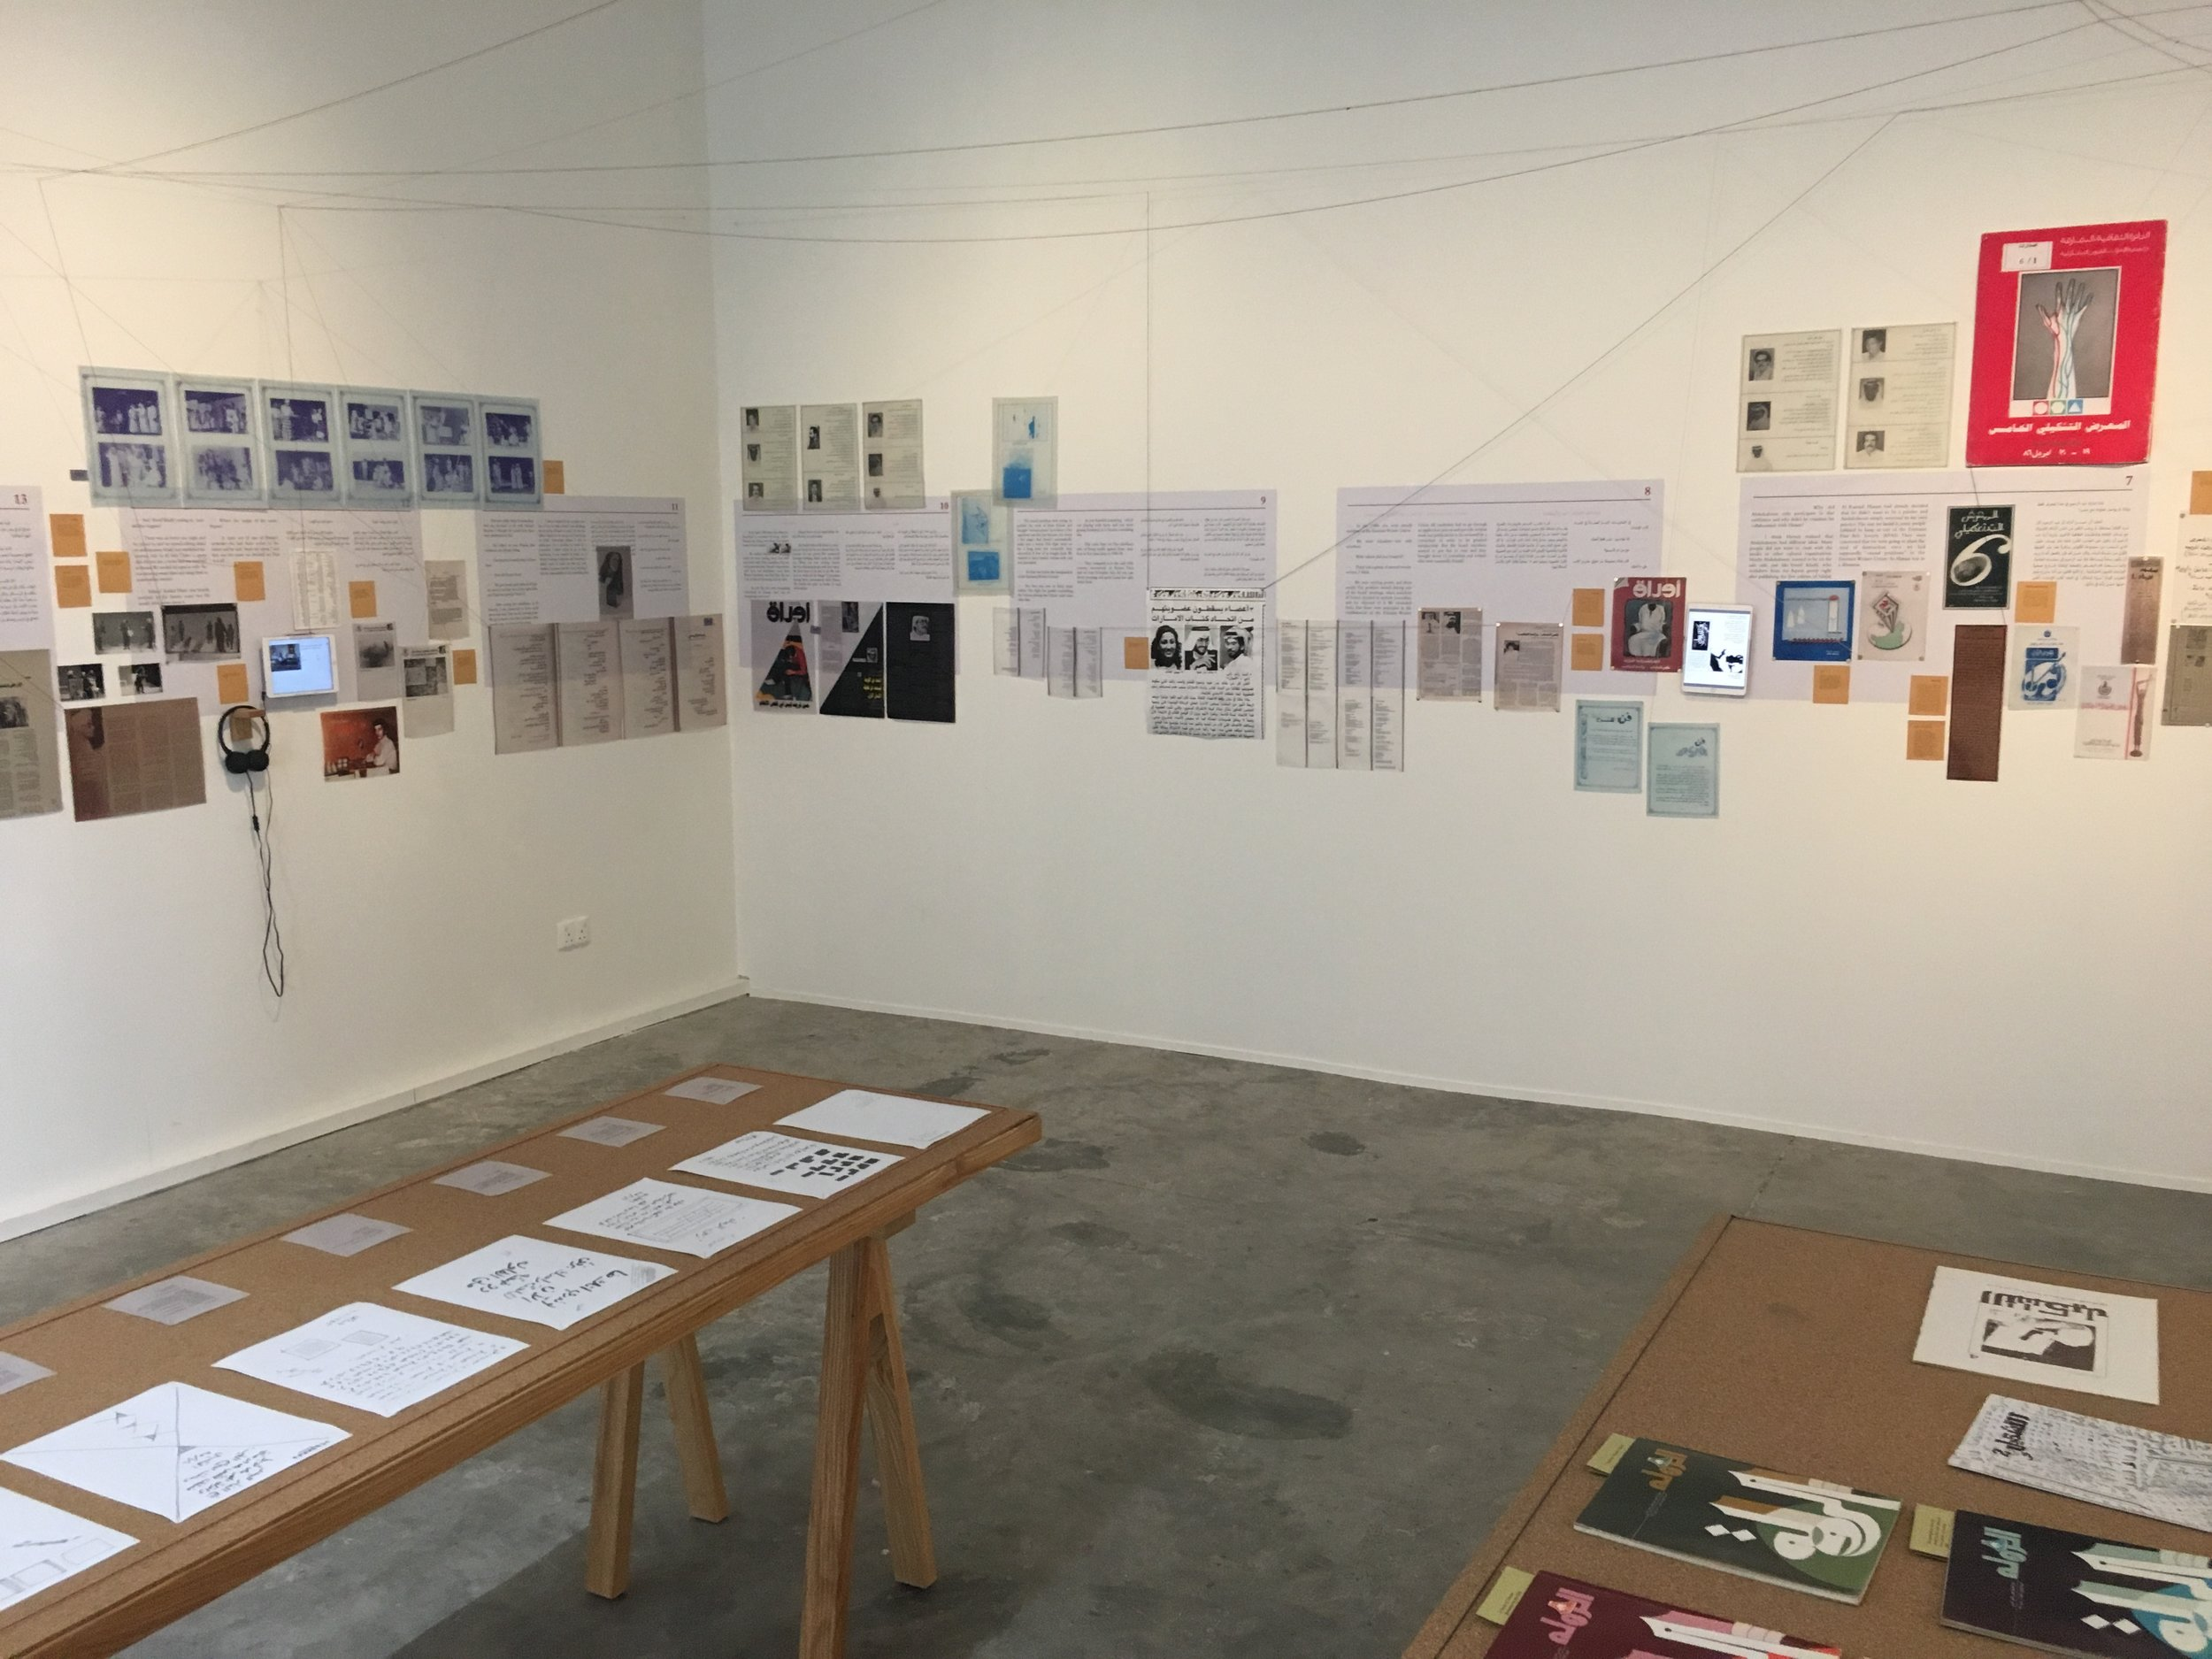 Part of Art Jameel's Research Studio: Annotations presentation in Alserkal Avenue. Image taken by Anna Seaman.